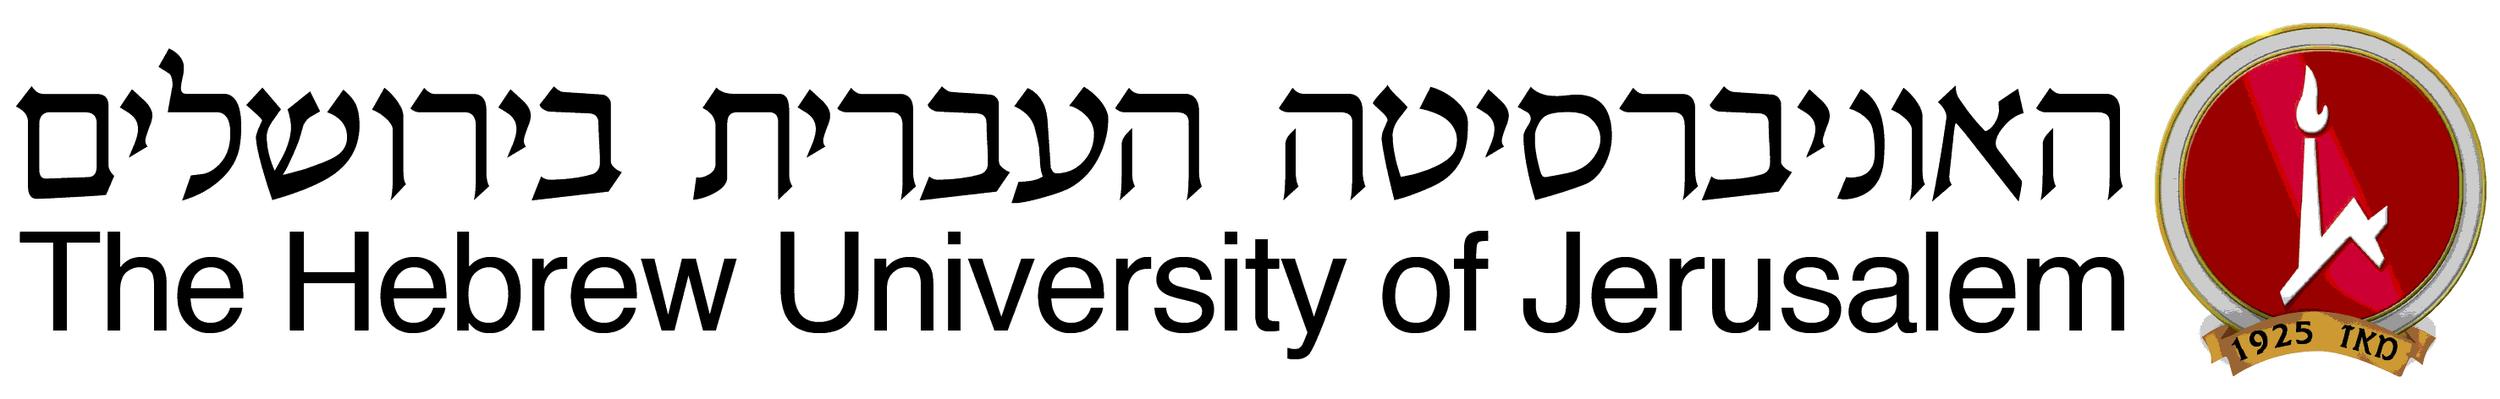 HebrewUniversity.jpg